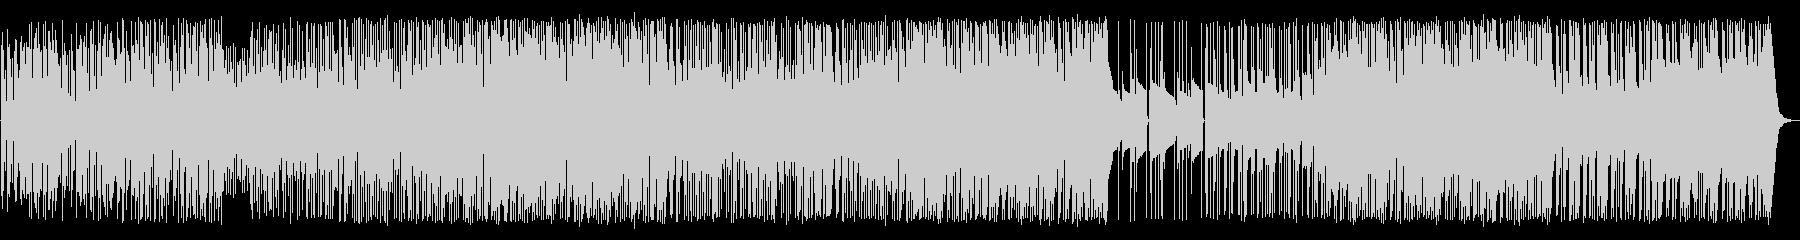 RPG洞窟/ホラー/DarkTypeの未再生の波形